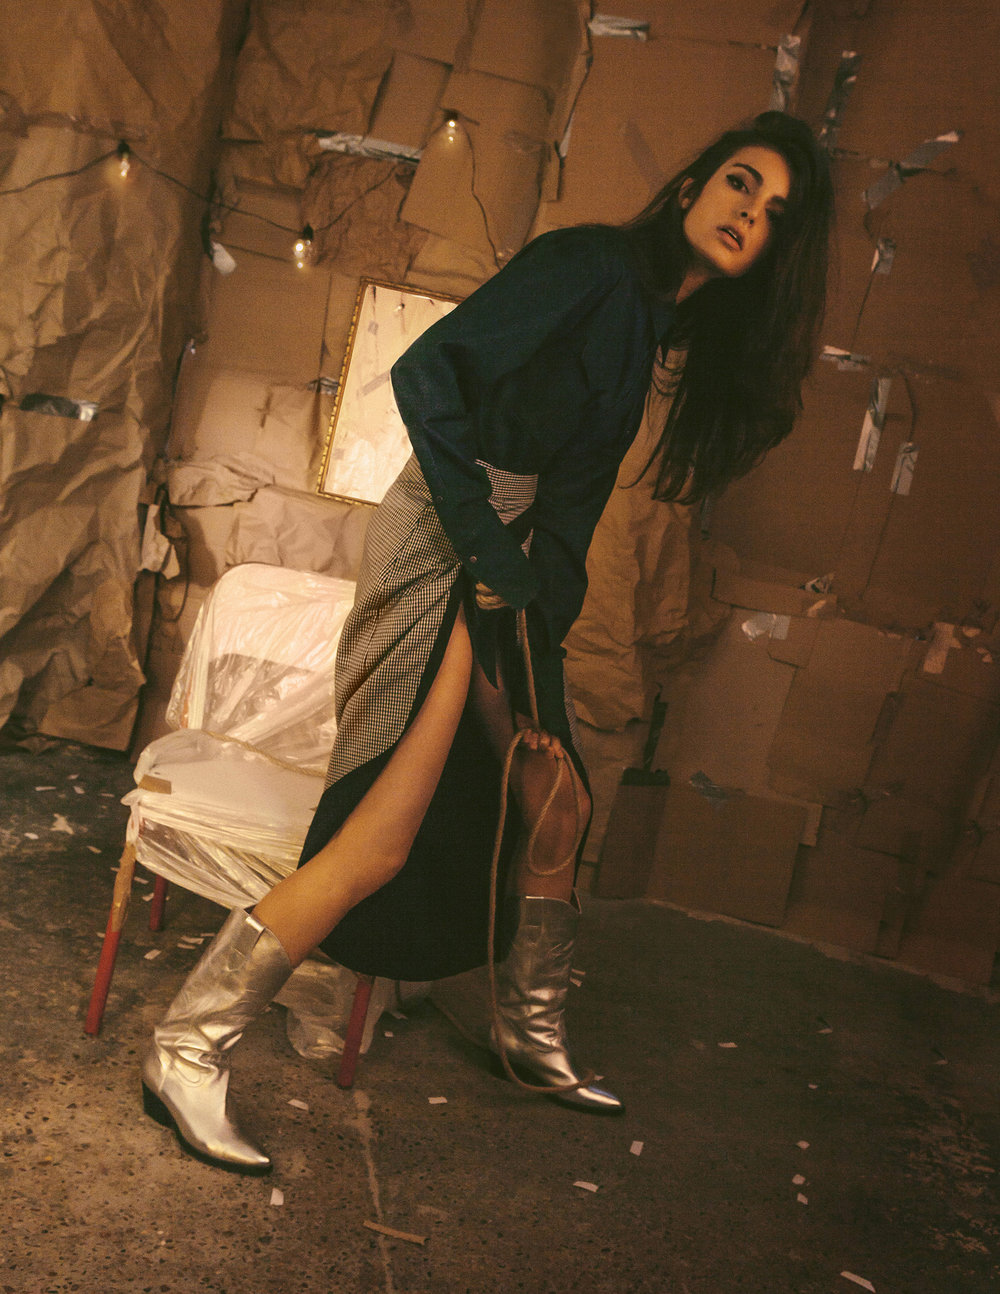 Denim Jacket STEVE JIN @FashionCrossover Top ANNE MARIE KIROLLOS @FashionCrossover Boots Malan Breton